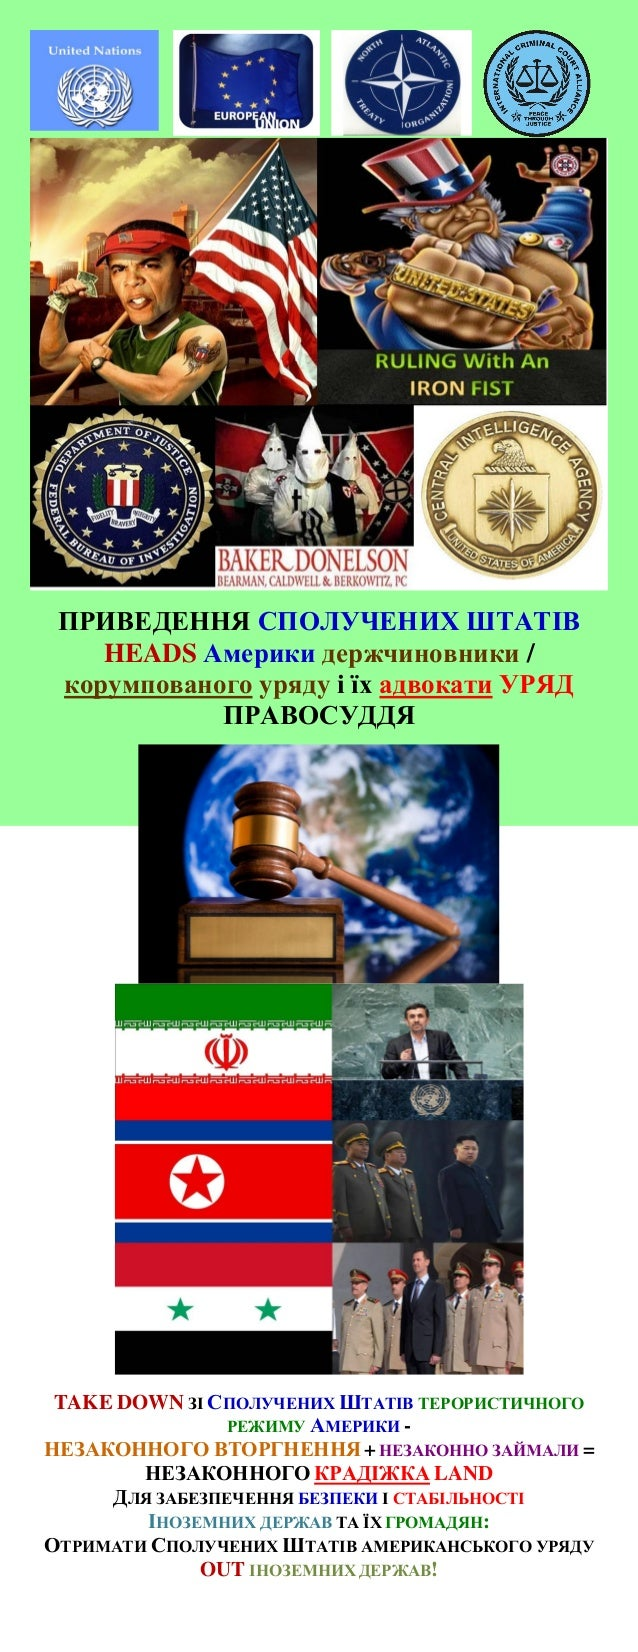 04/14/13 PUBLIC NOTICE (031113 FAX TO BARACK OBAMA) - ukrainian